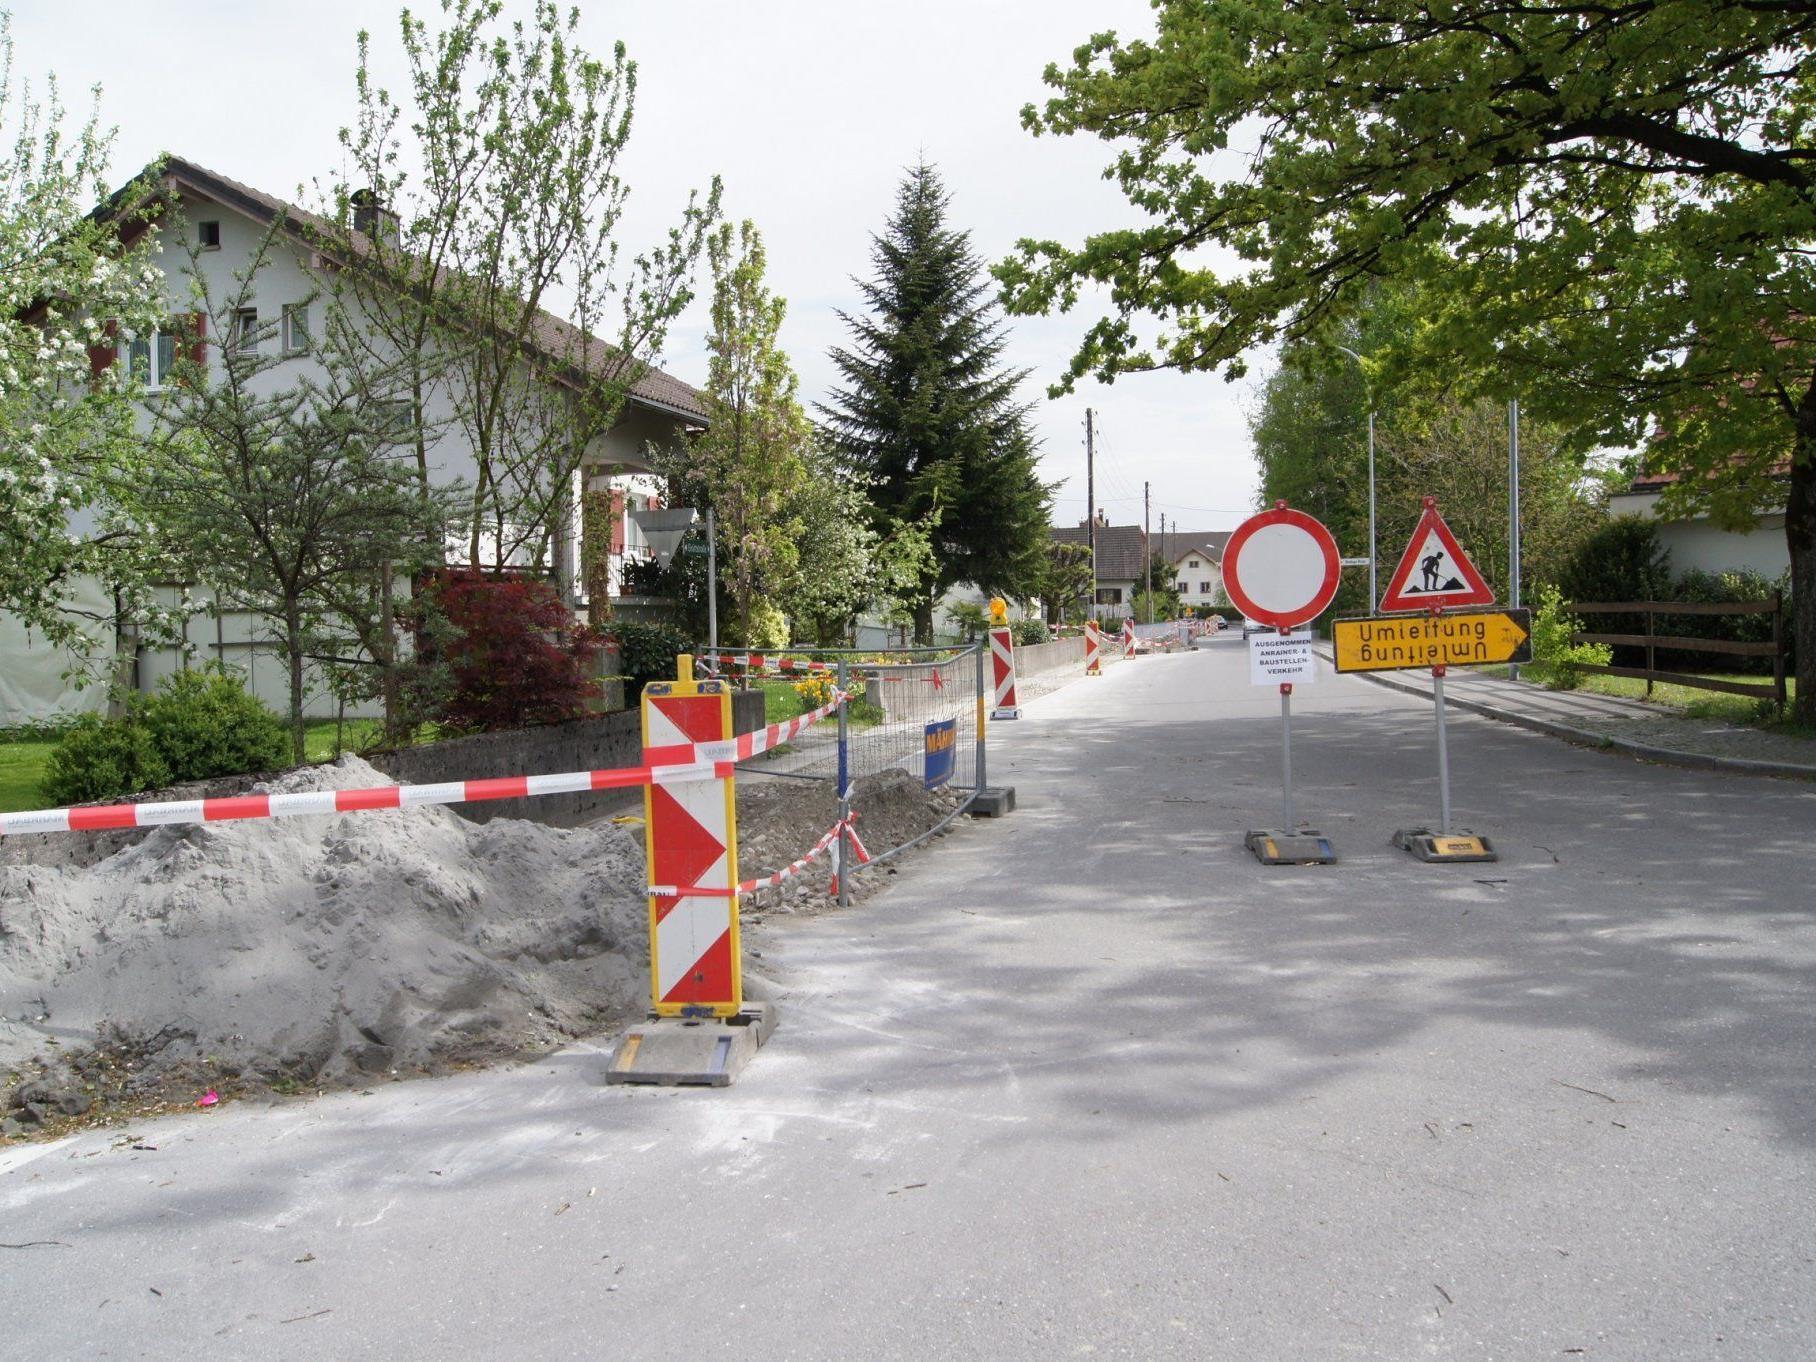 Das Teilstück der Grüttstraße ist gesperrt.